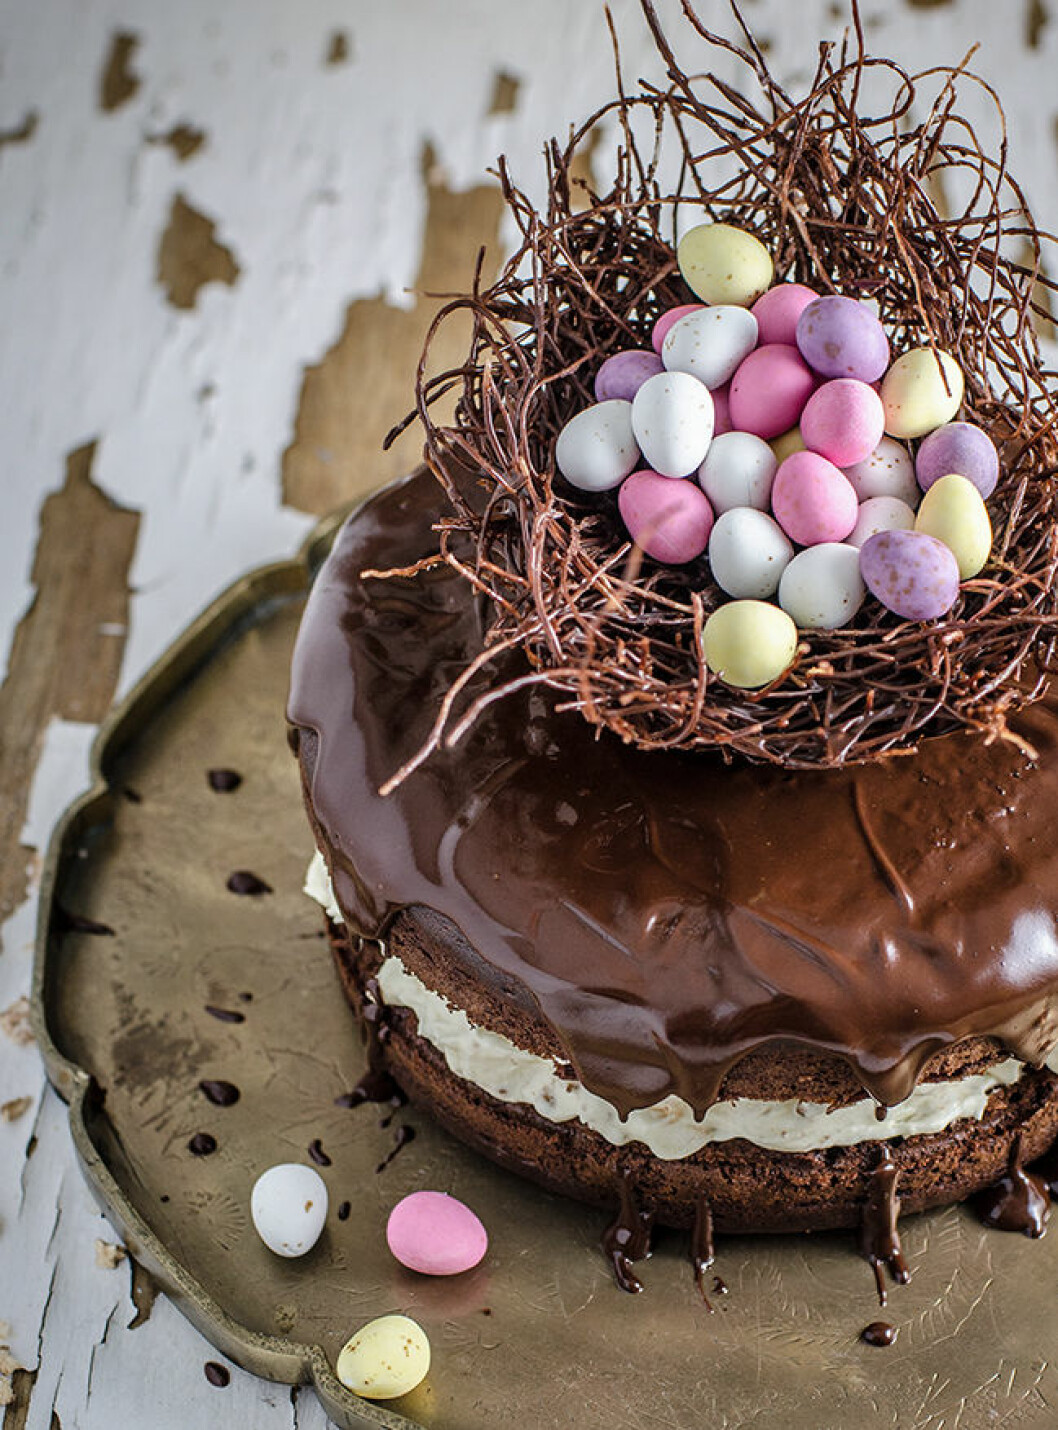 Chokladtårta med fågelbo på toppen, fågelbotårta till påsk